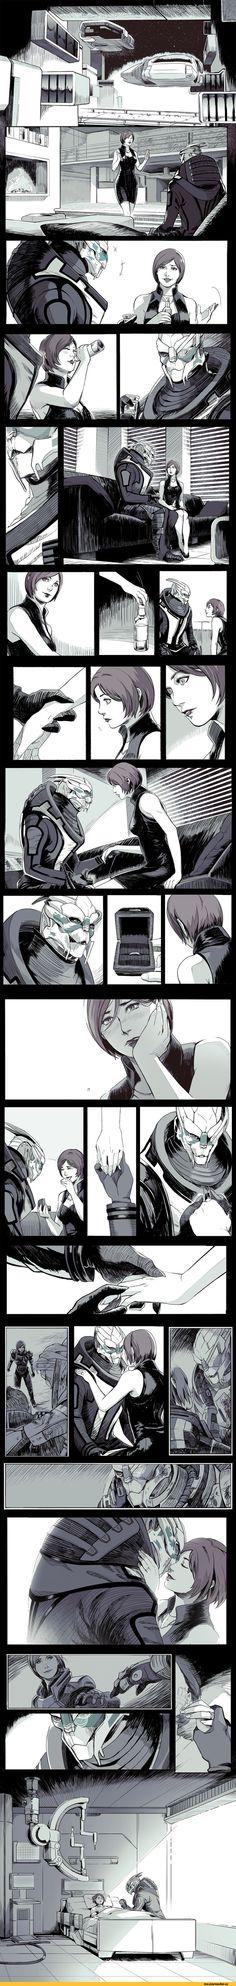 Garrus & Shepard: Engagement